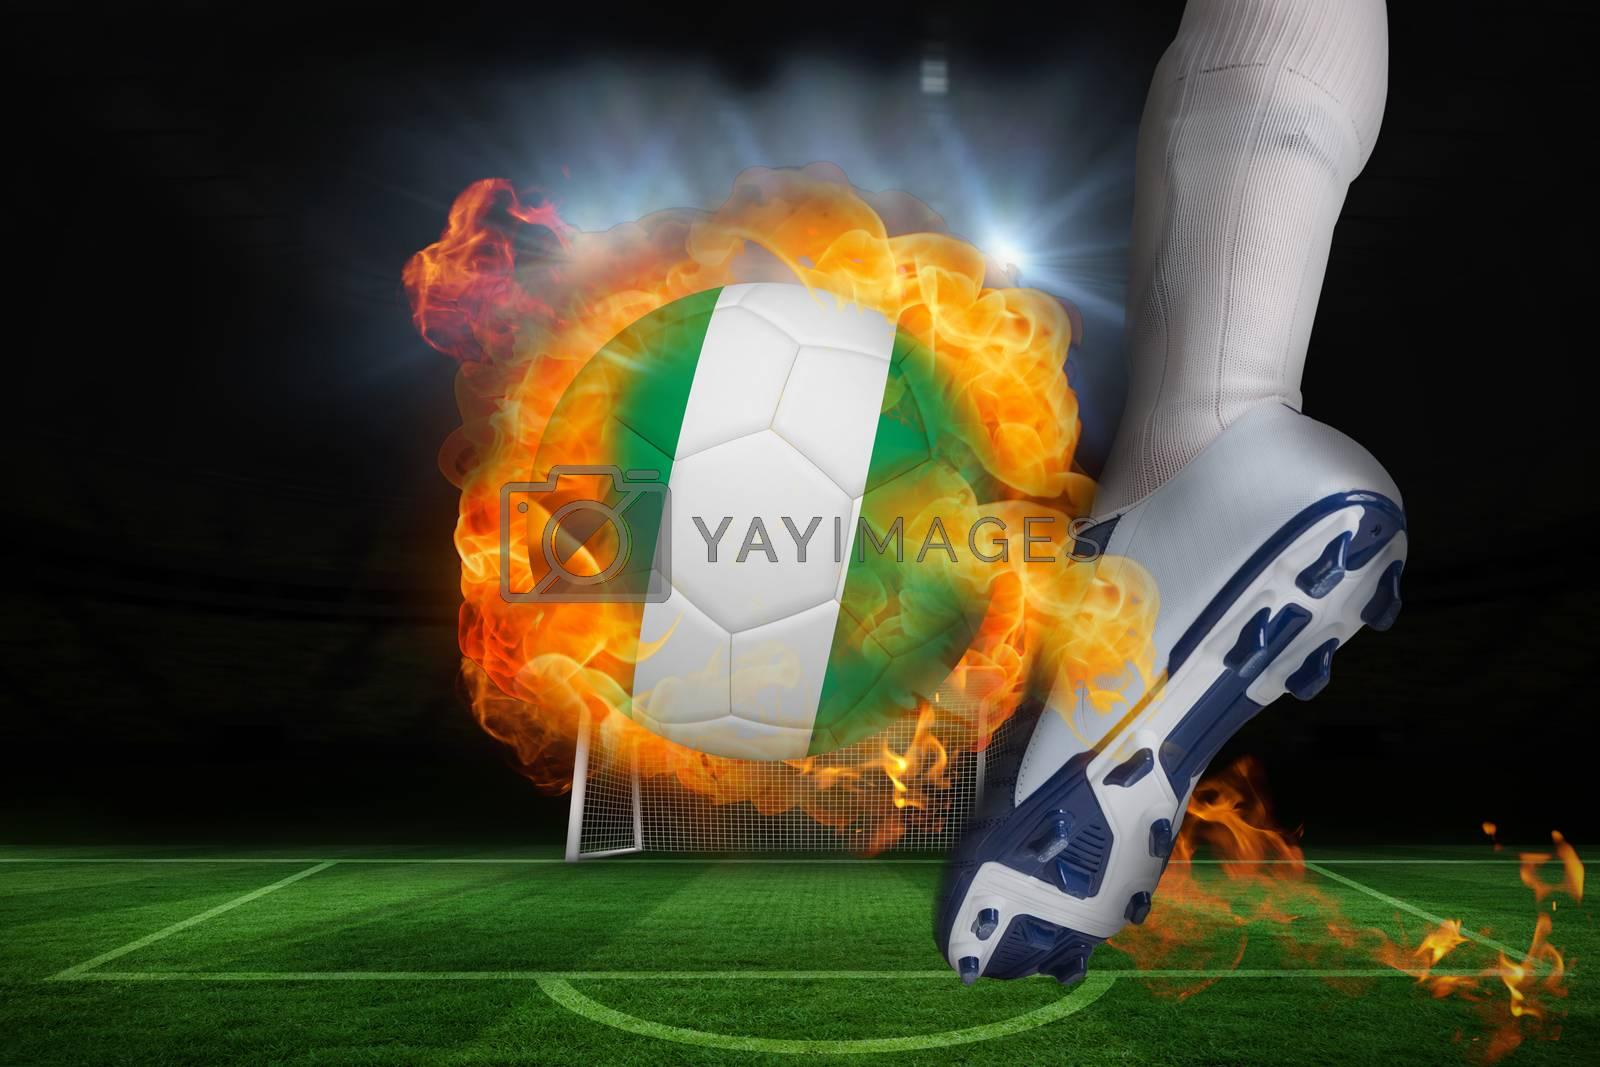 Football player kicking flaming nigeria flag ball by Wavebreakmedia